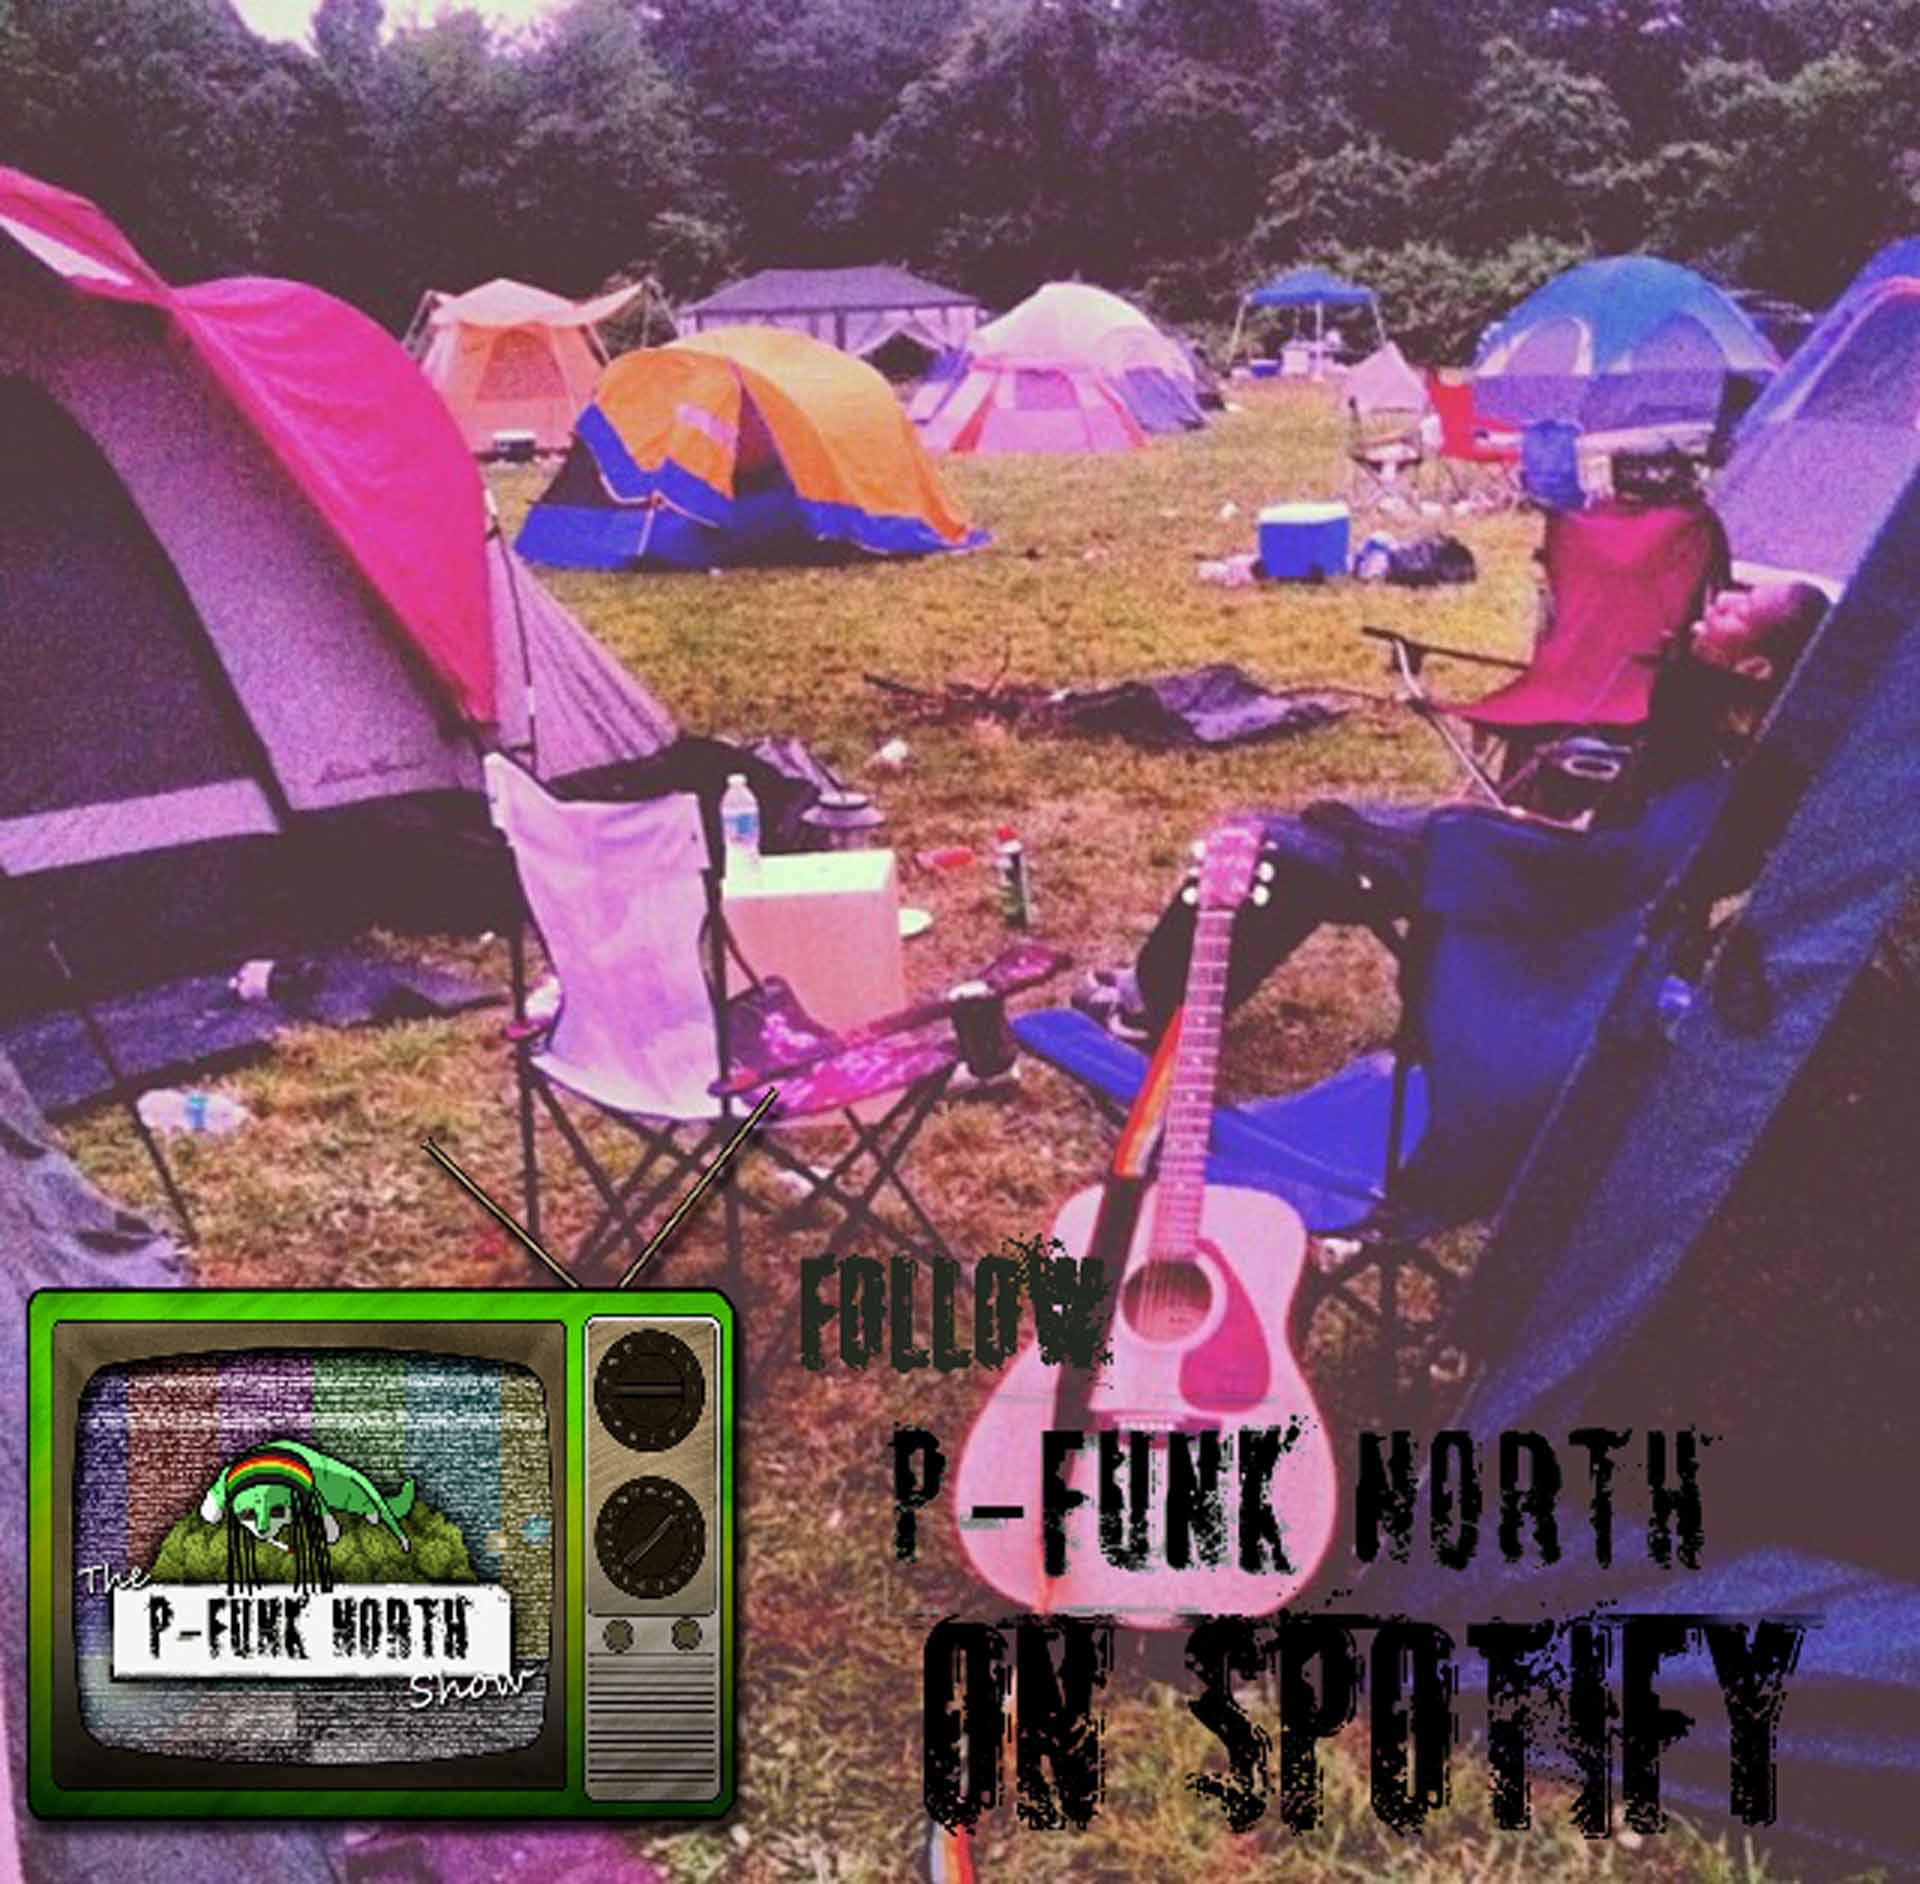 P-Funk North on Spotify.jpg